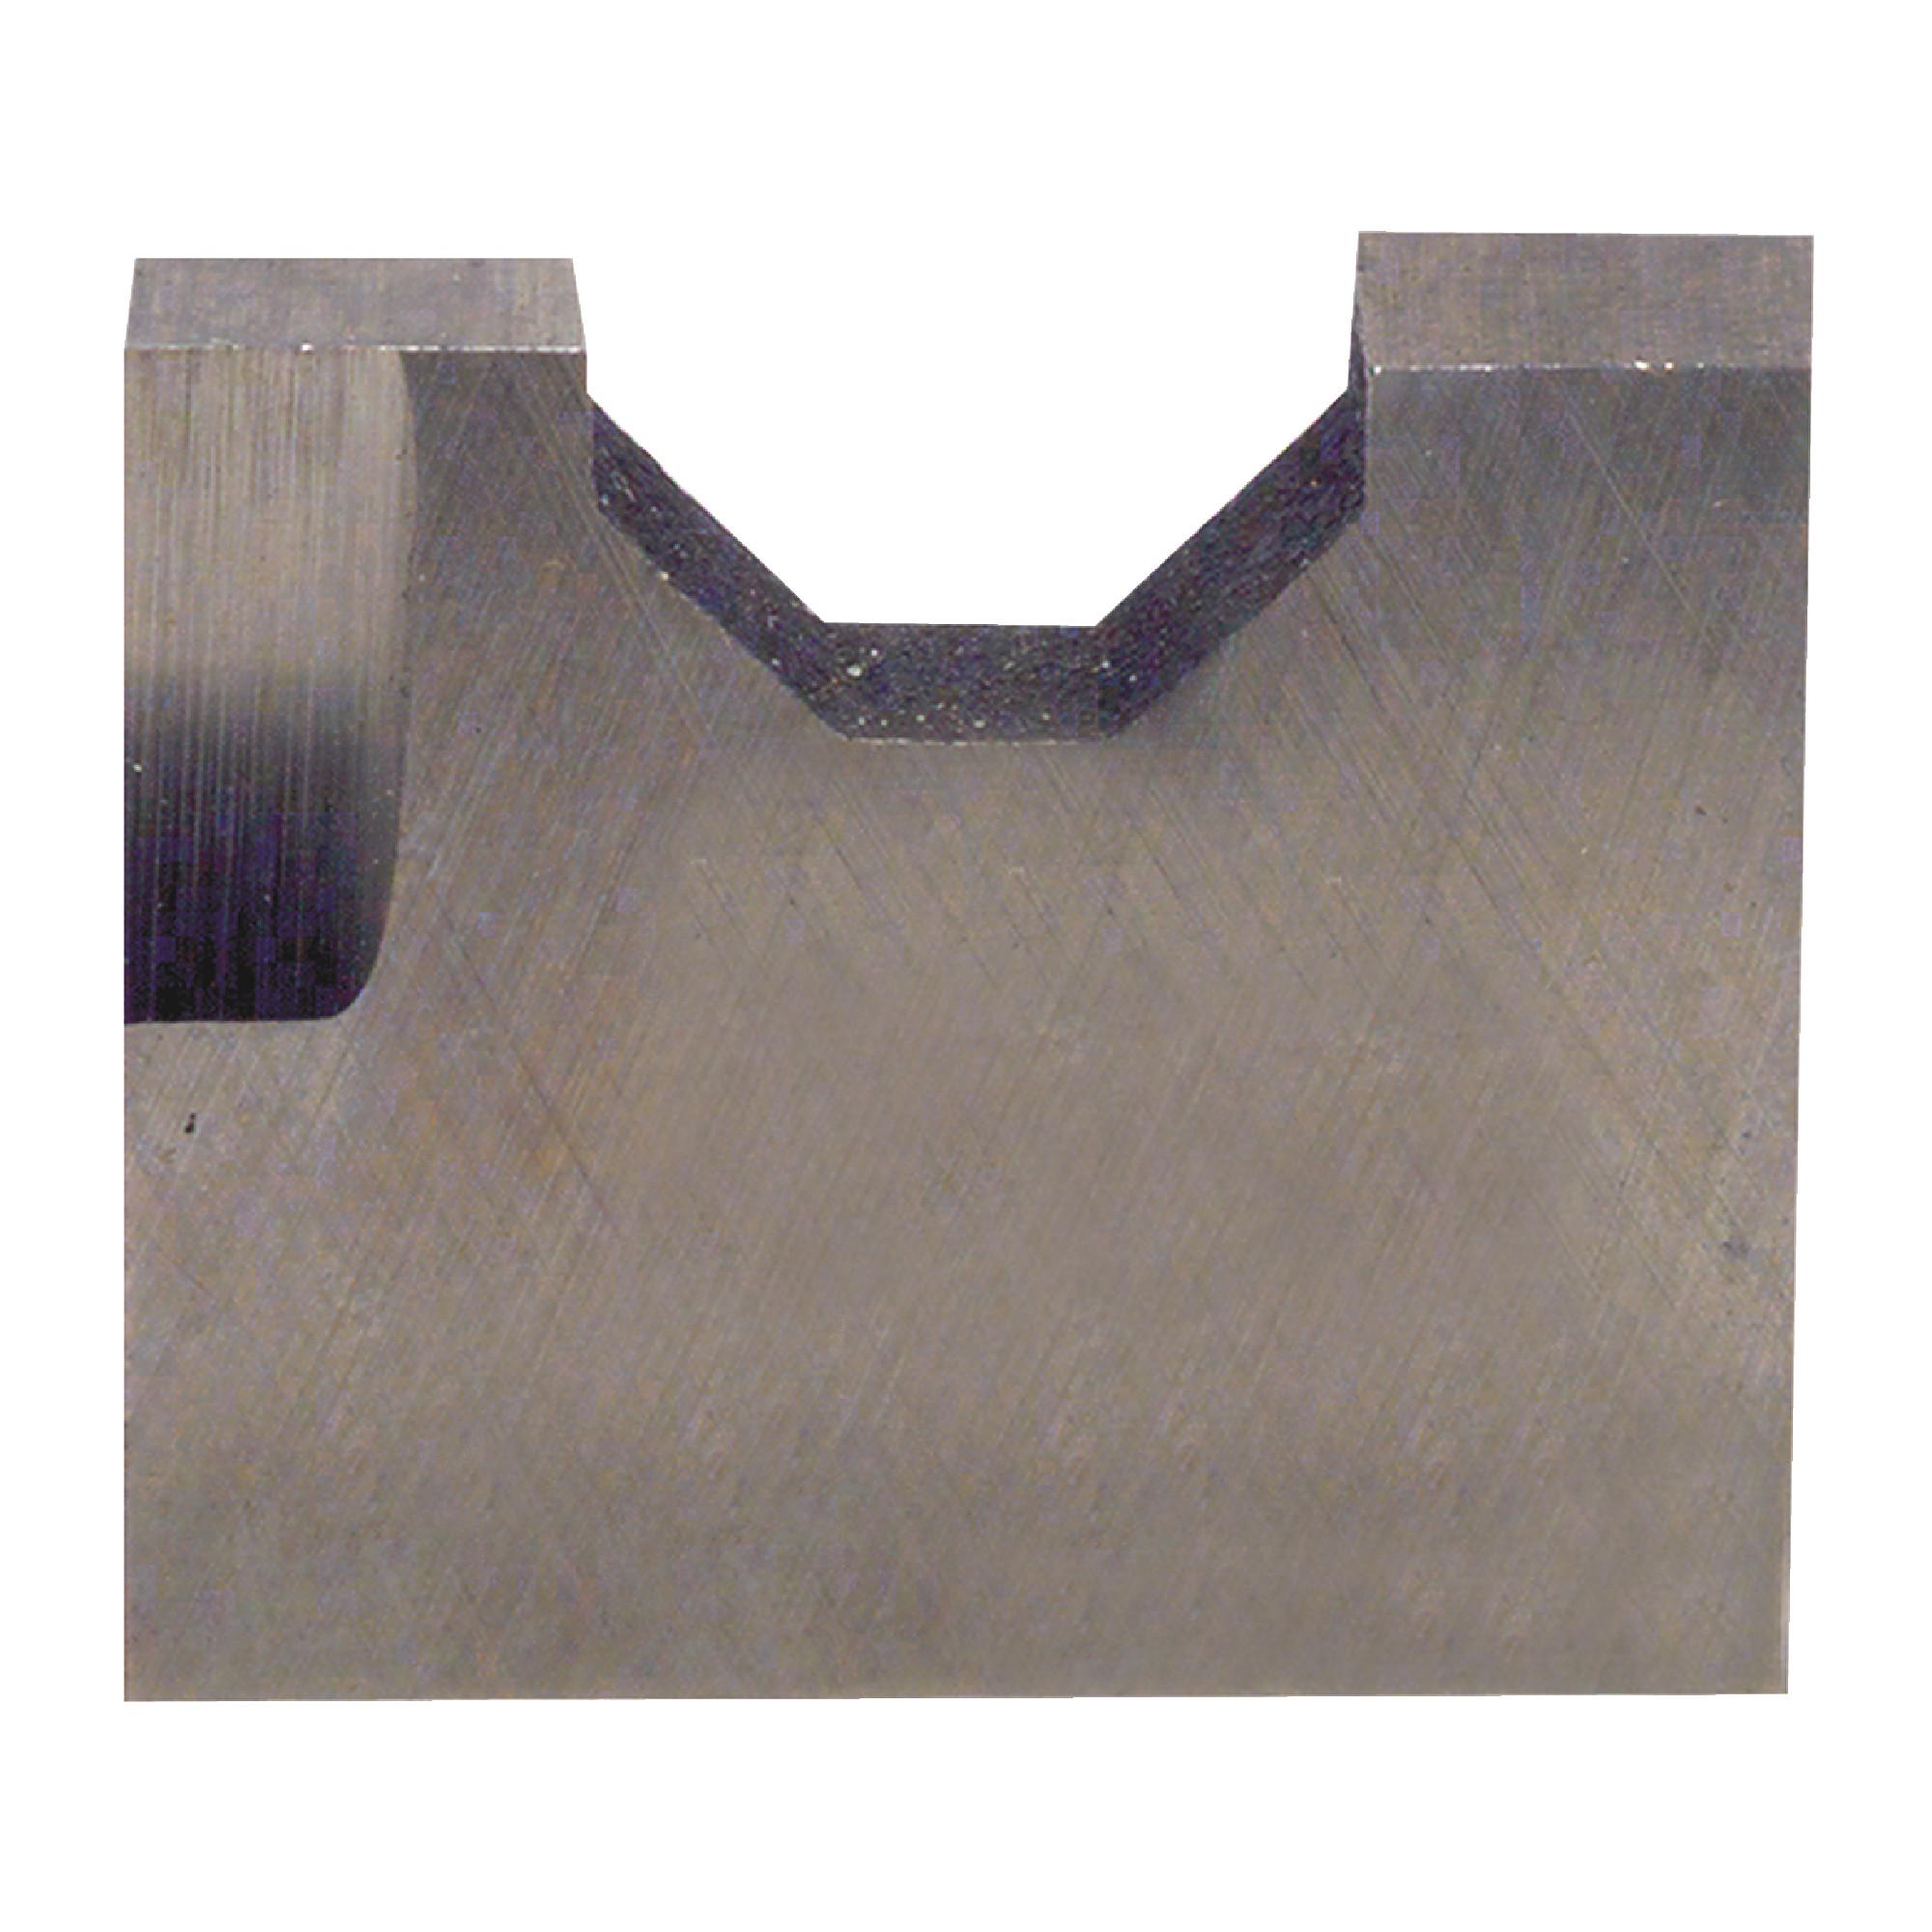 "APT - 1-1/2"" Cobalt Counterbore Blade / Series: E"